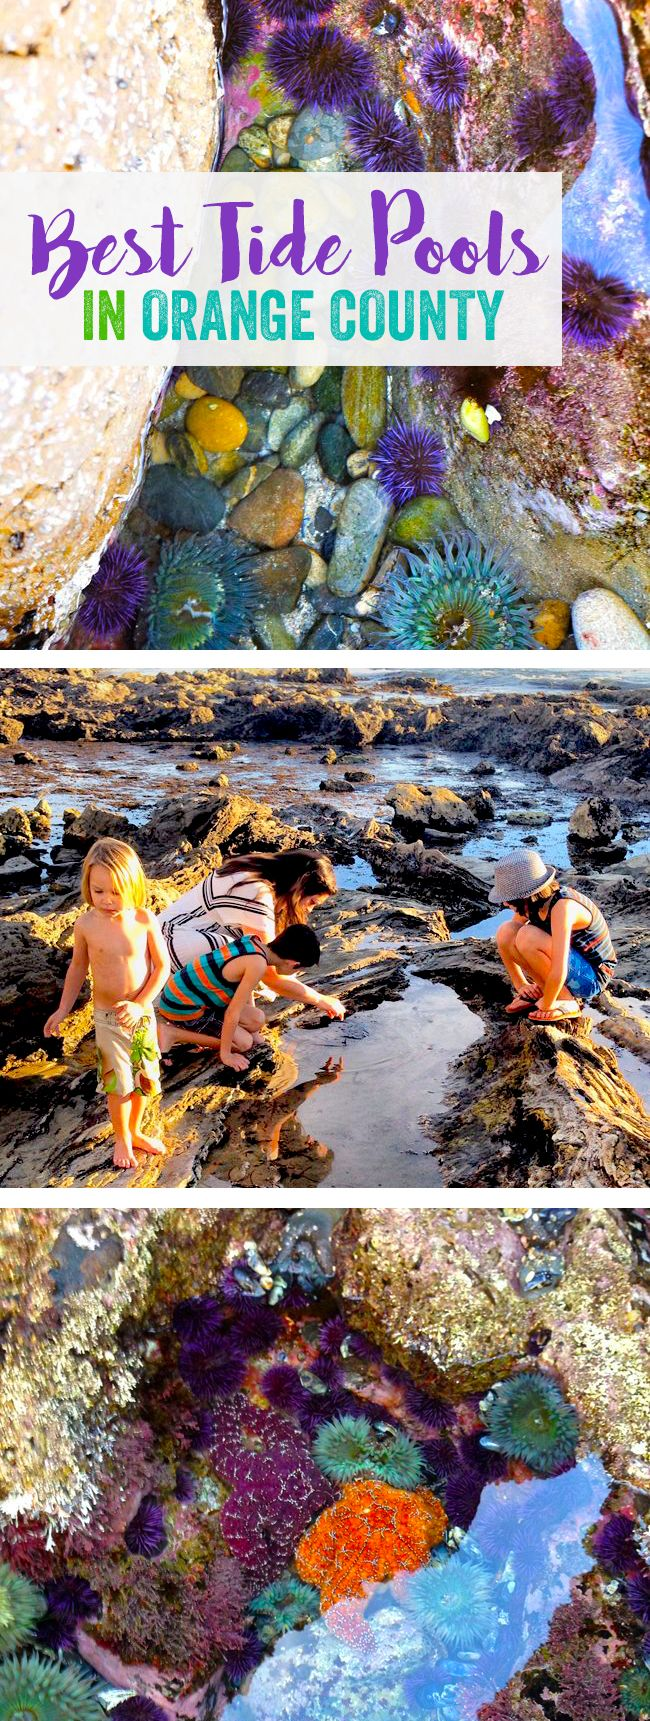 7 Family-friendly tide pools in Orange County, California.